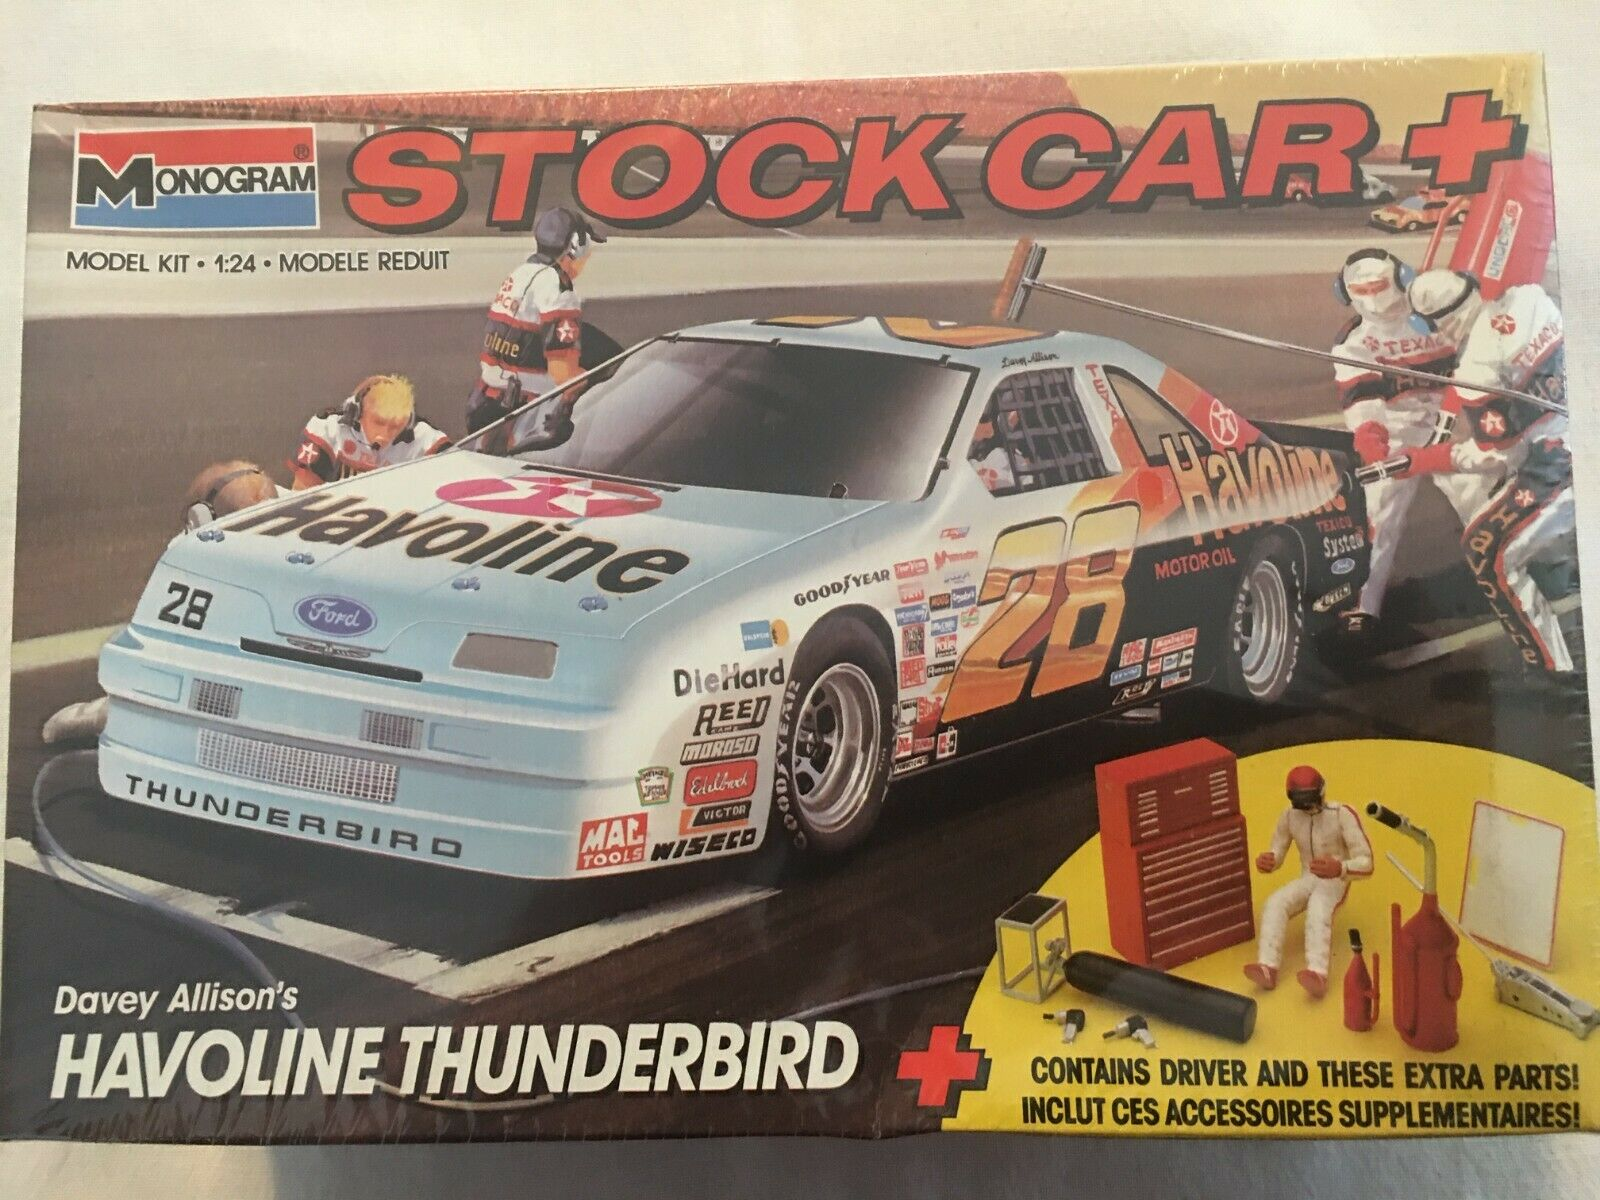 1990 Monogram 28 Davey Allison Havoline Thunderbird Stock Car Kit - $18.50